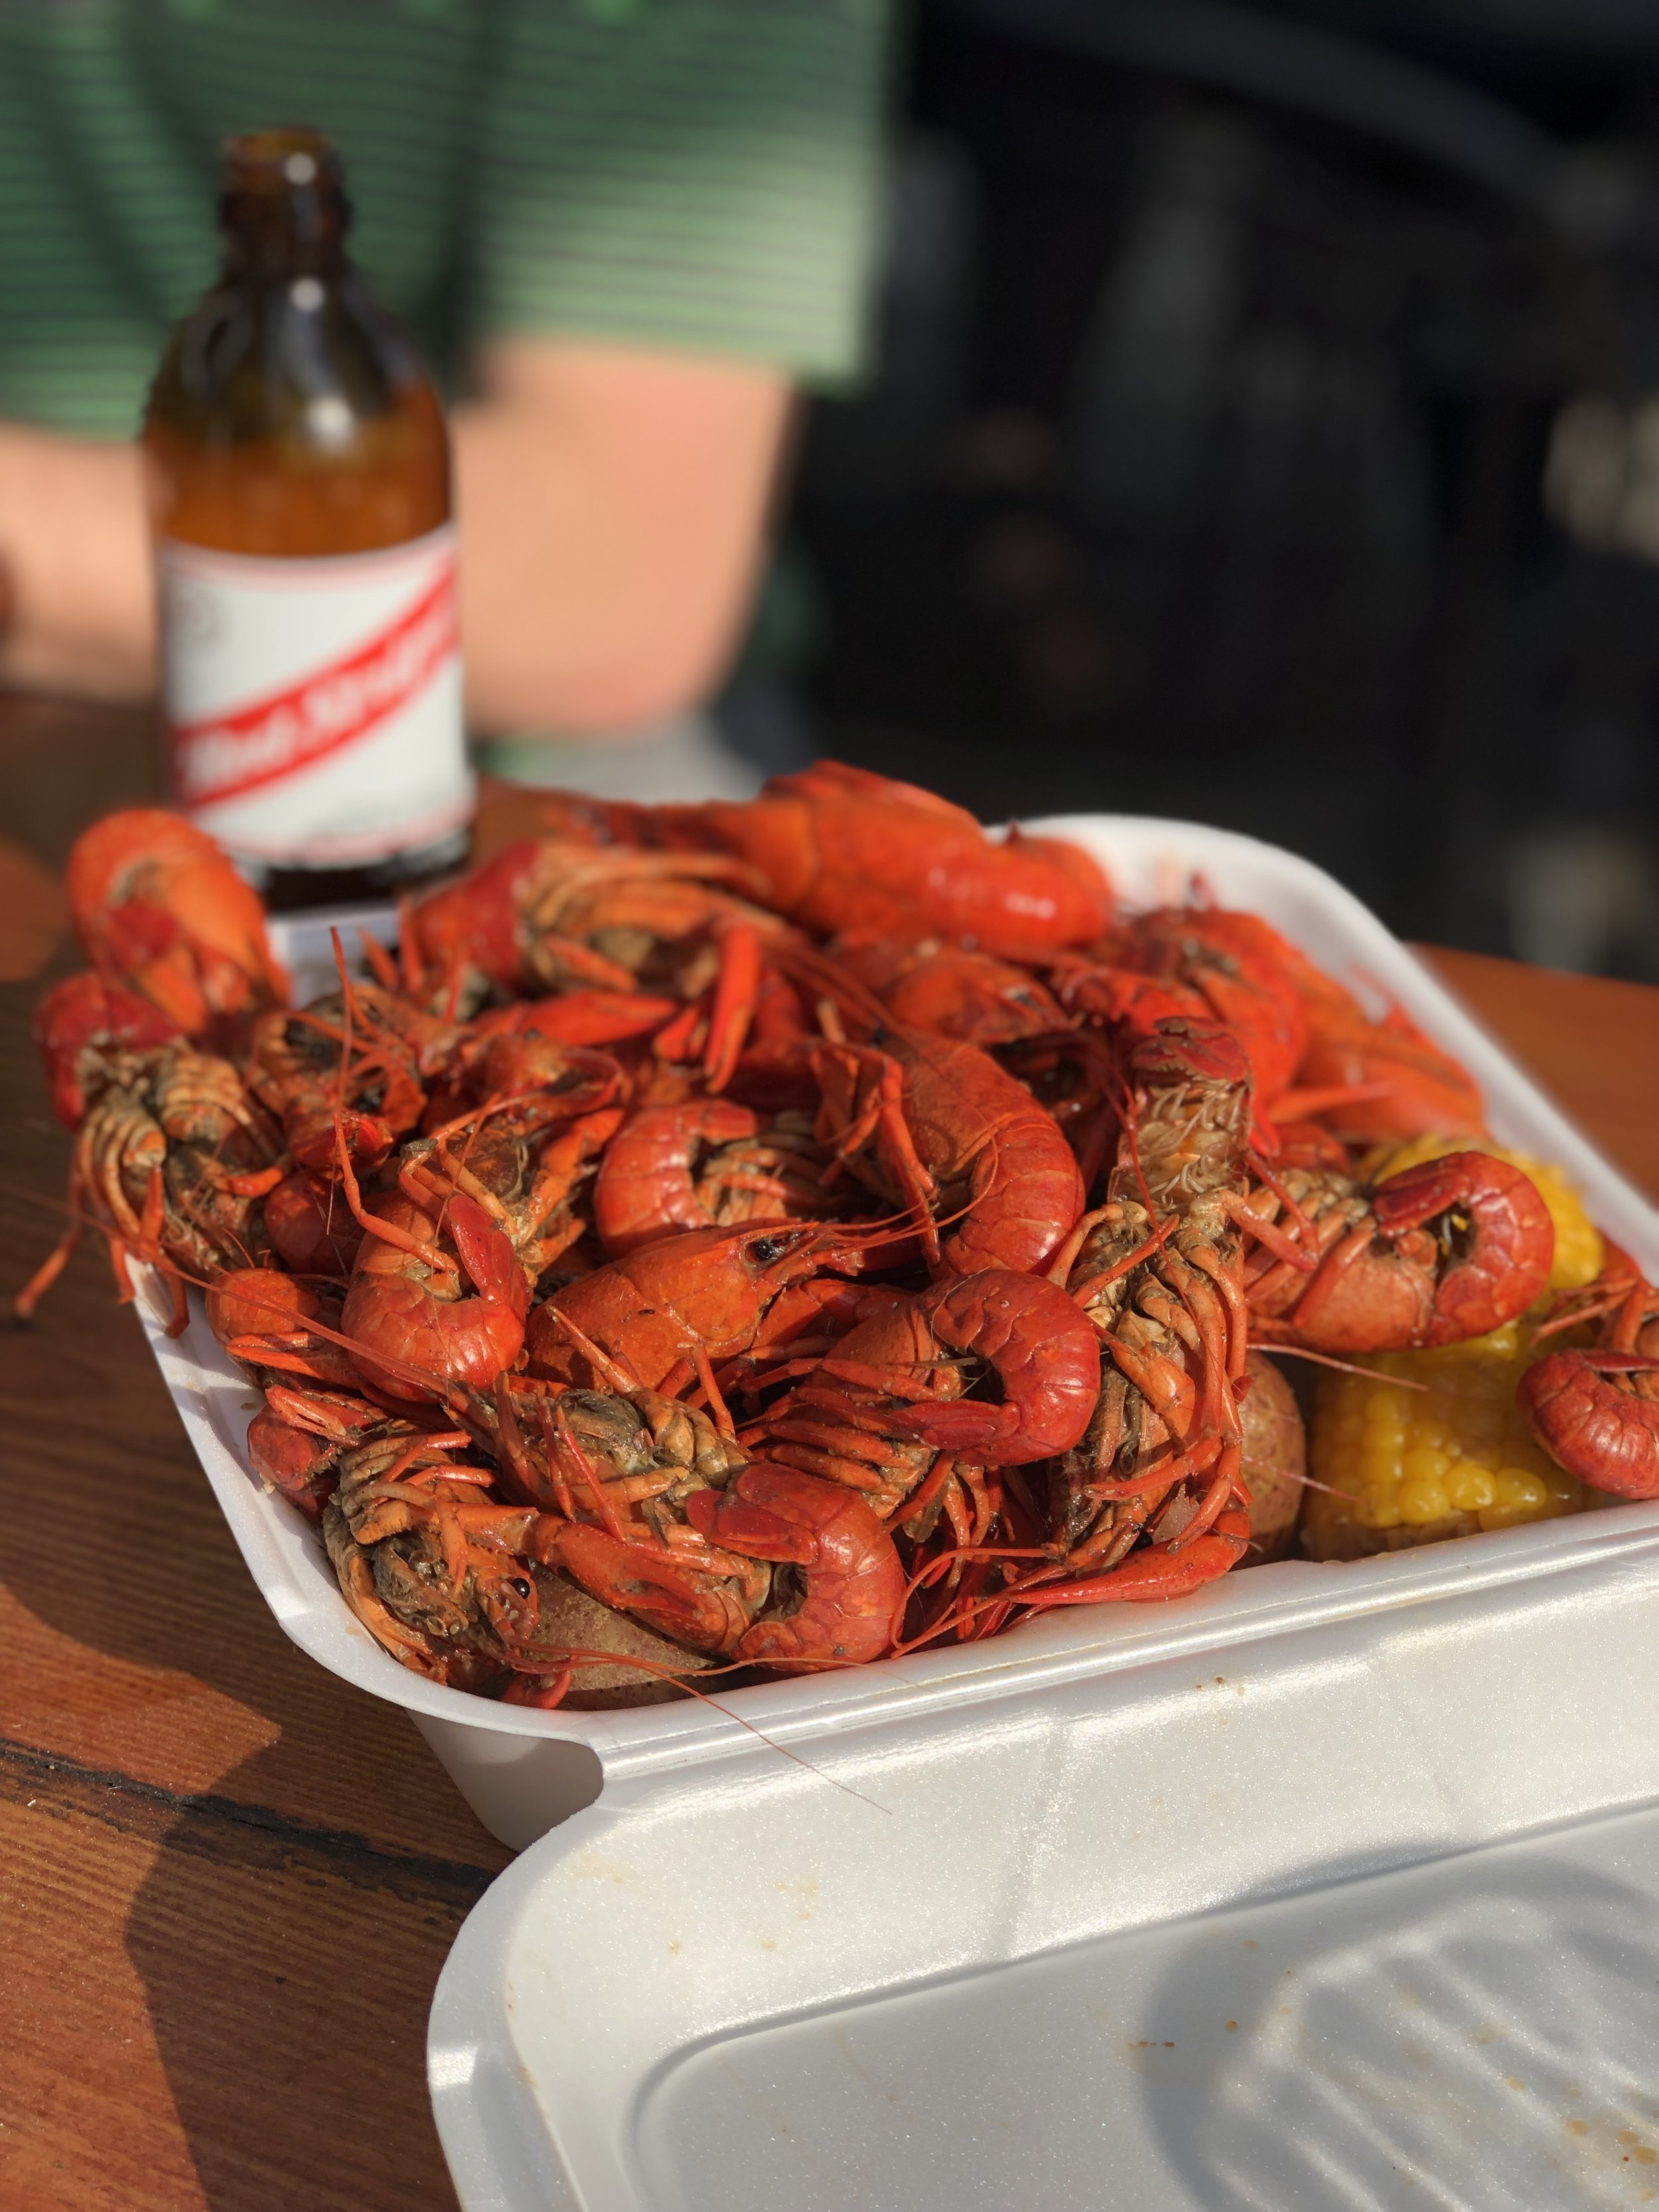 Crawfish at Bayou Beer Garden